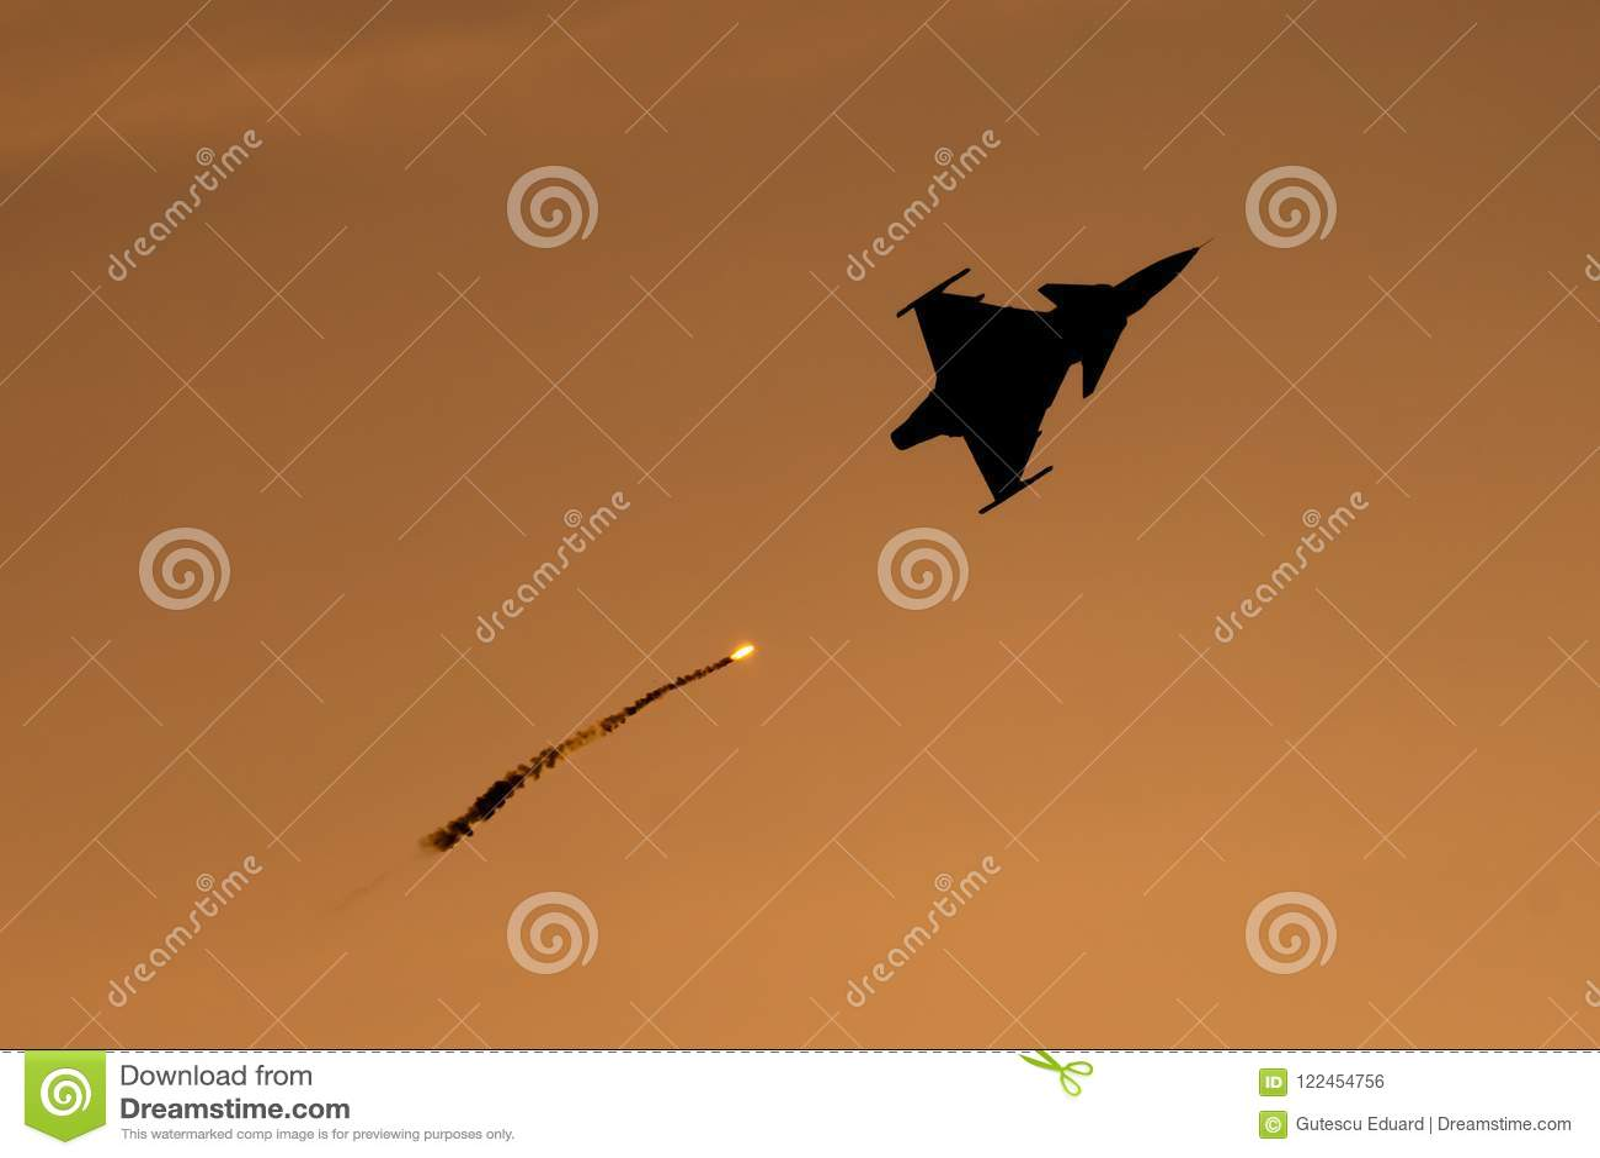 Bucharest international air show BIAS, Saab 9 Gripen silhouette with flares